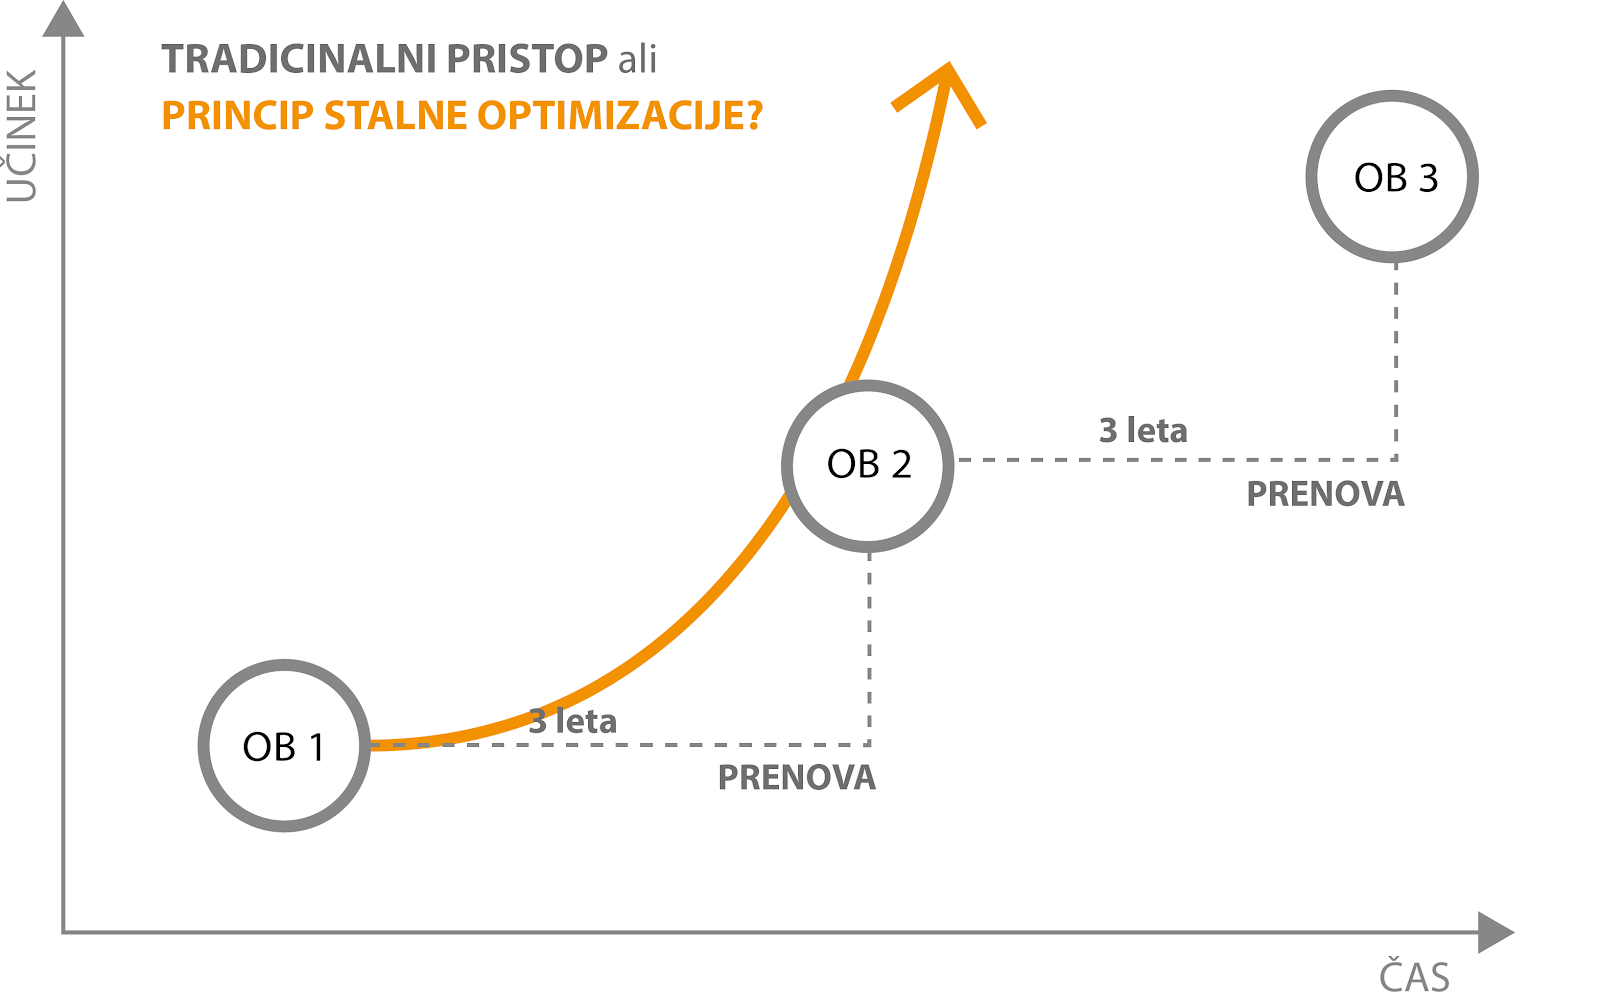 Princip stalne optimizacije spletne strani